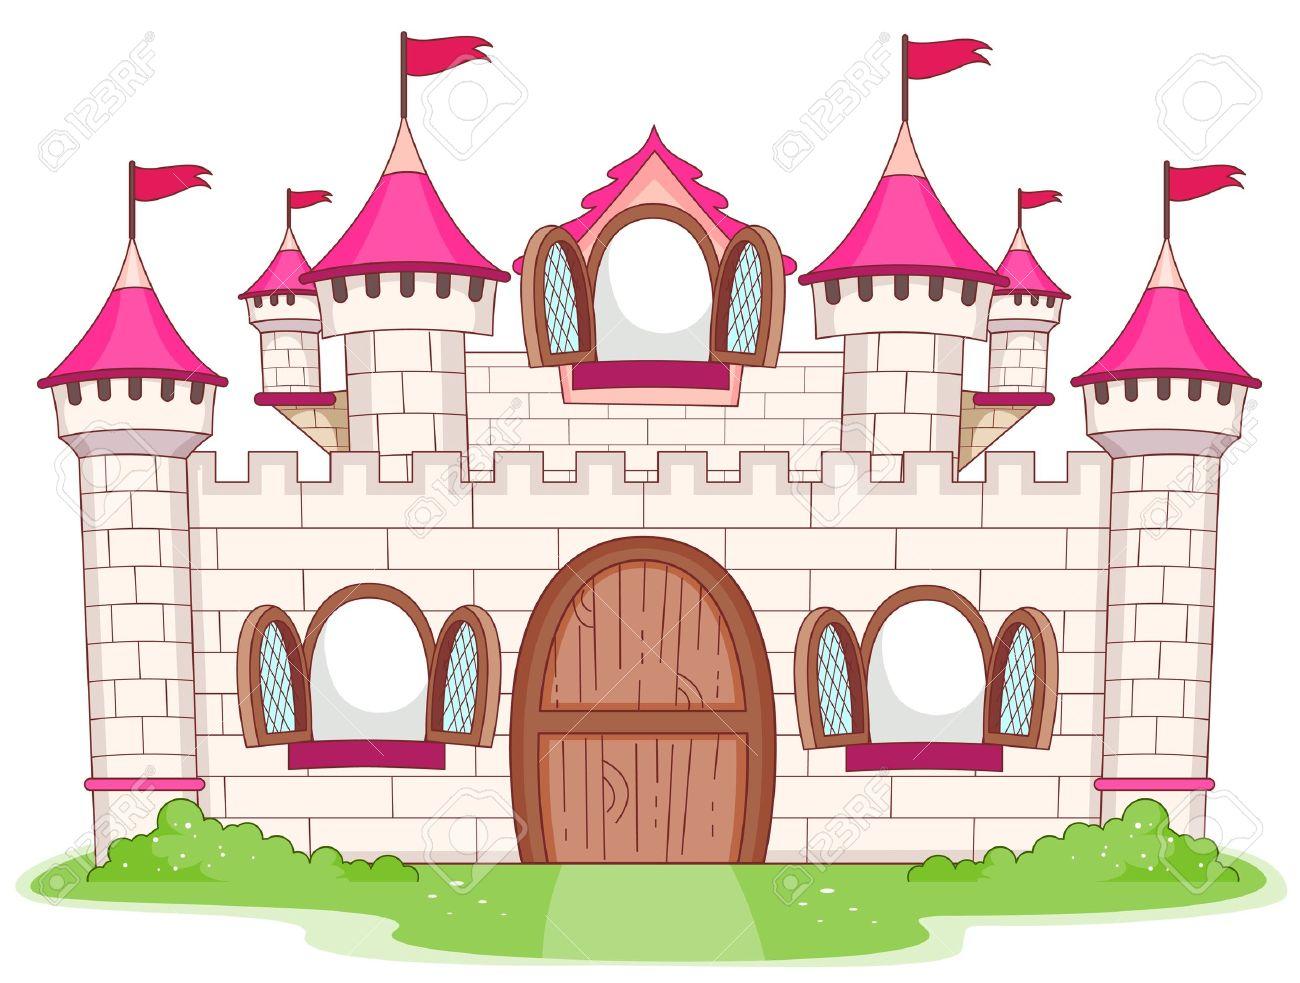 Palace clipart cartoon.